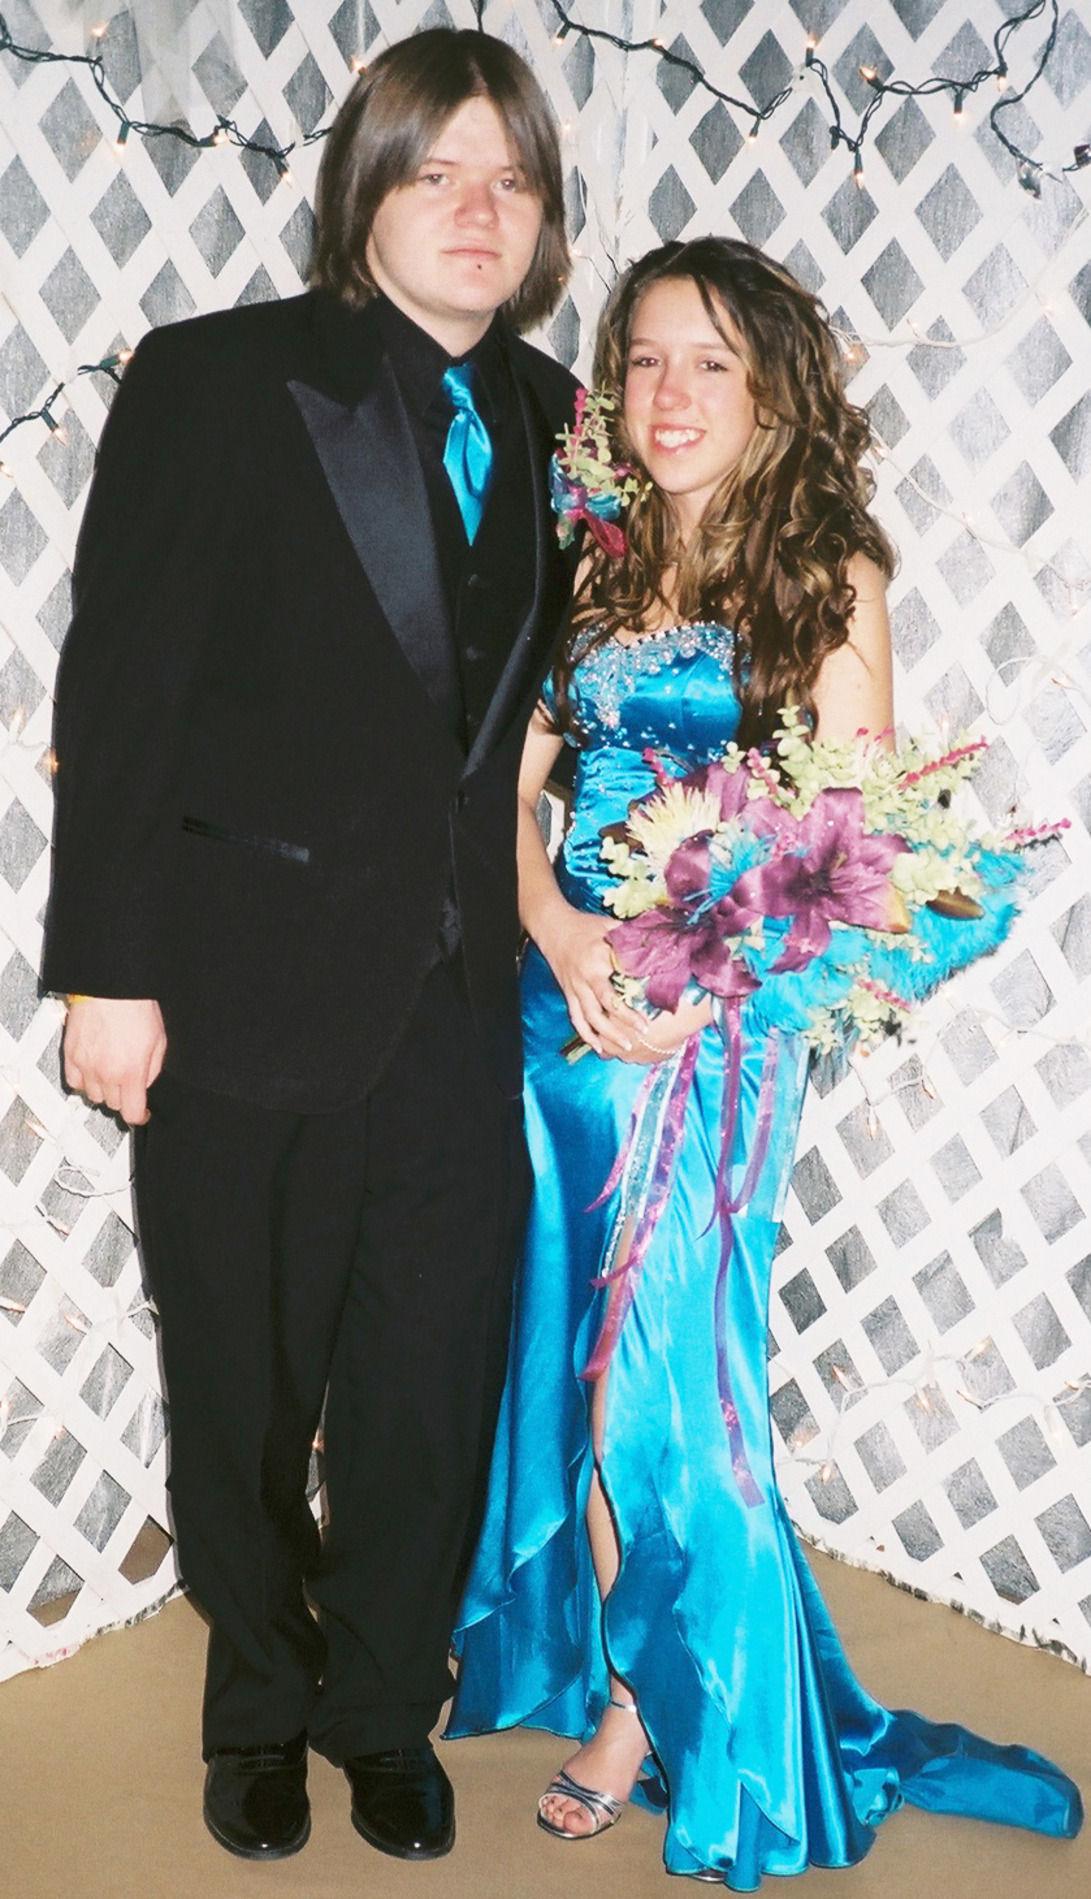 Luxury Tuxedo Ideas For Prom Photos - All Wedding Dresses ...